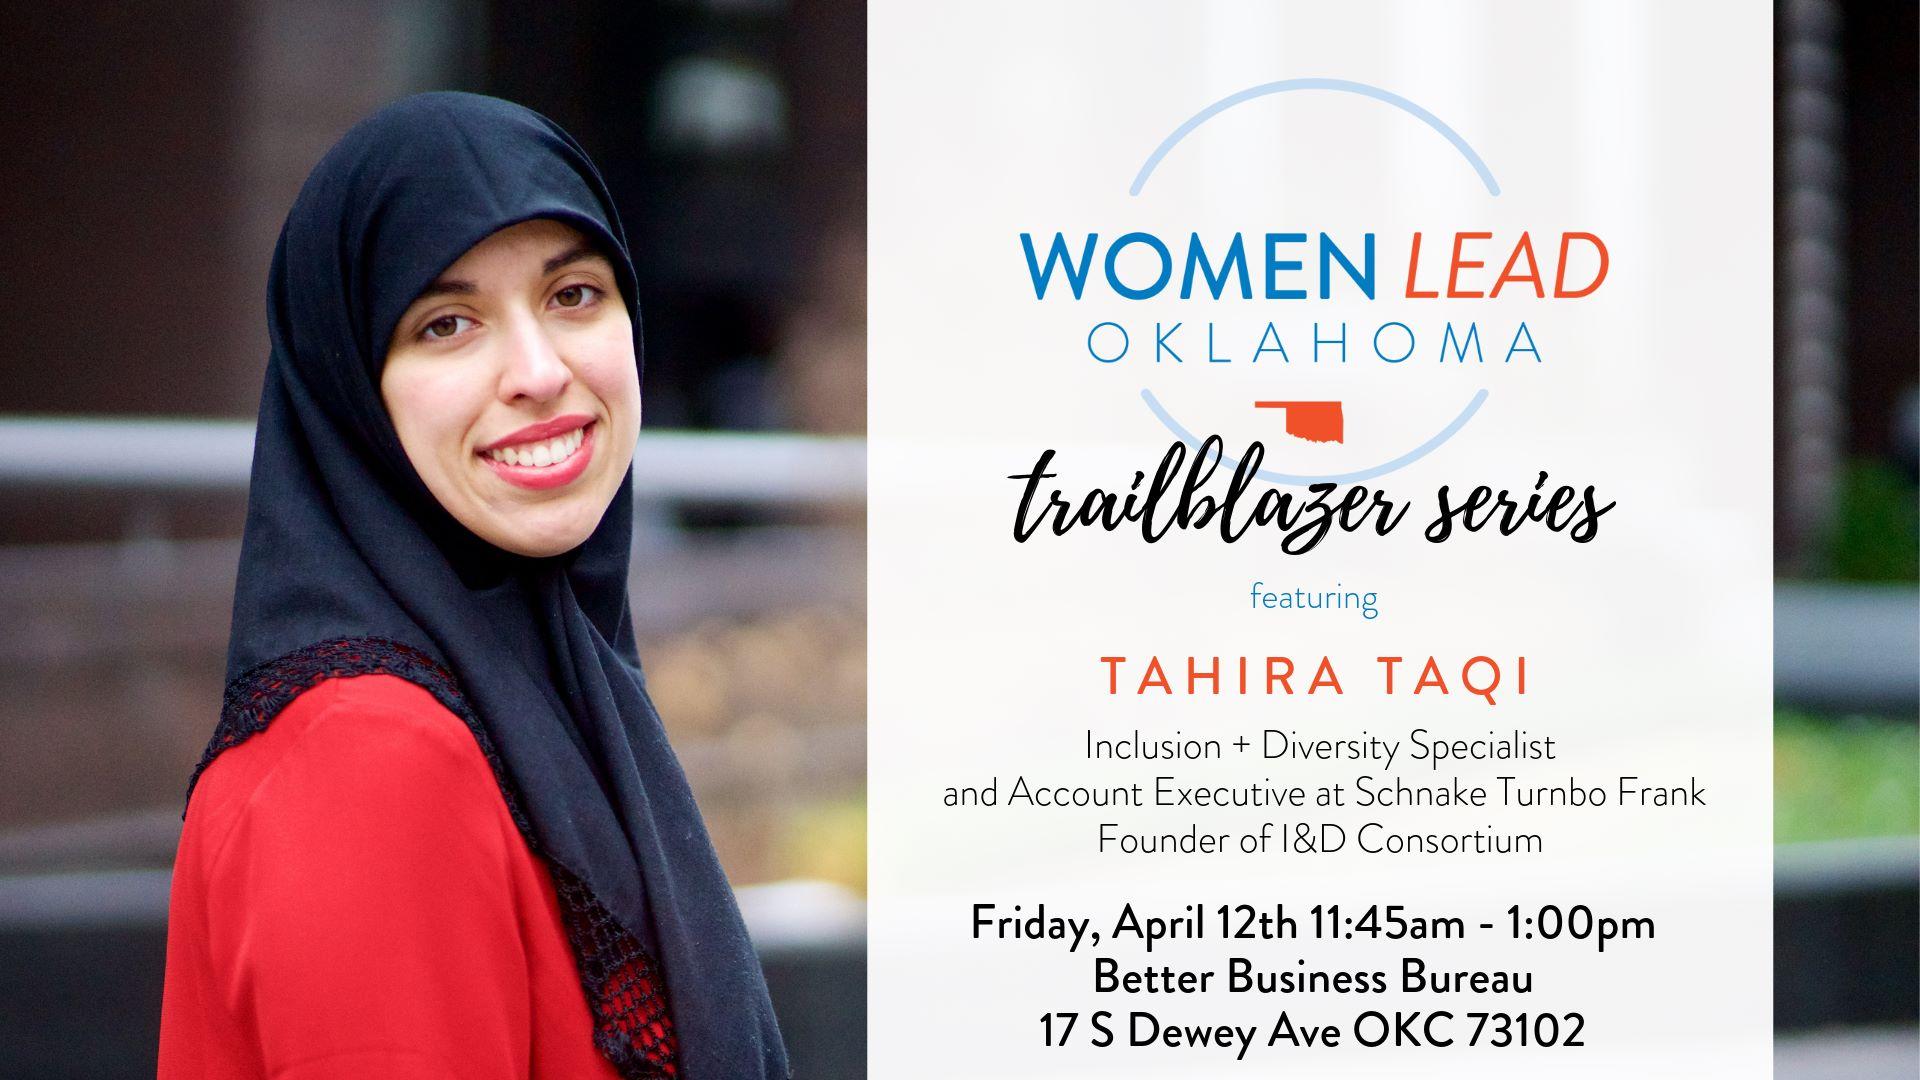 WLO-Trailblazer_Tahira-Taqi